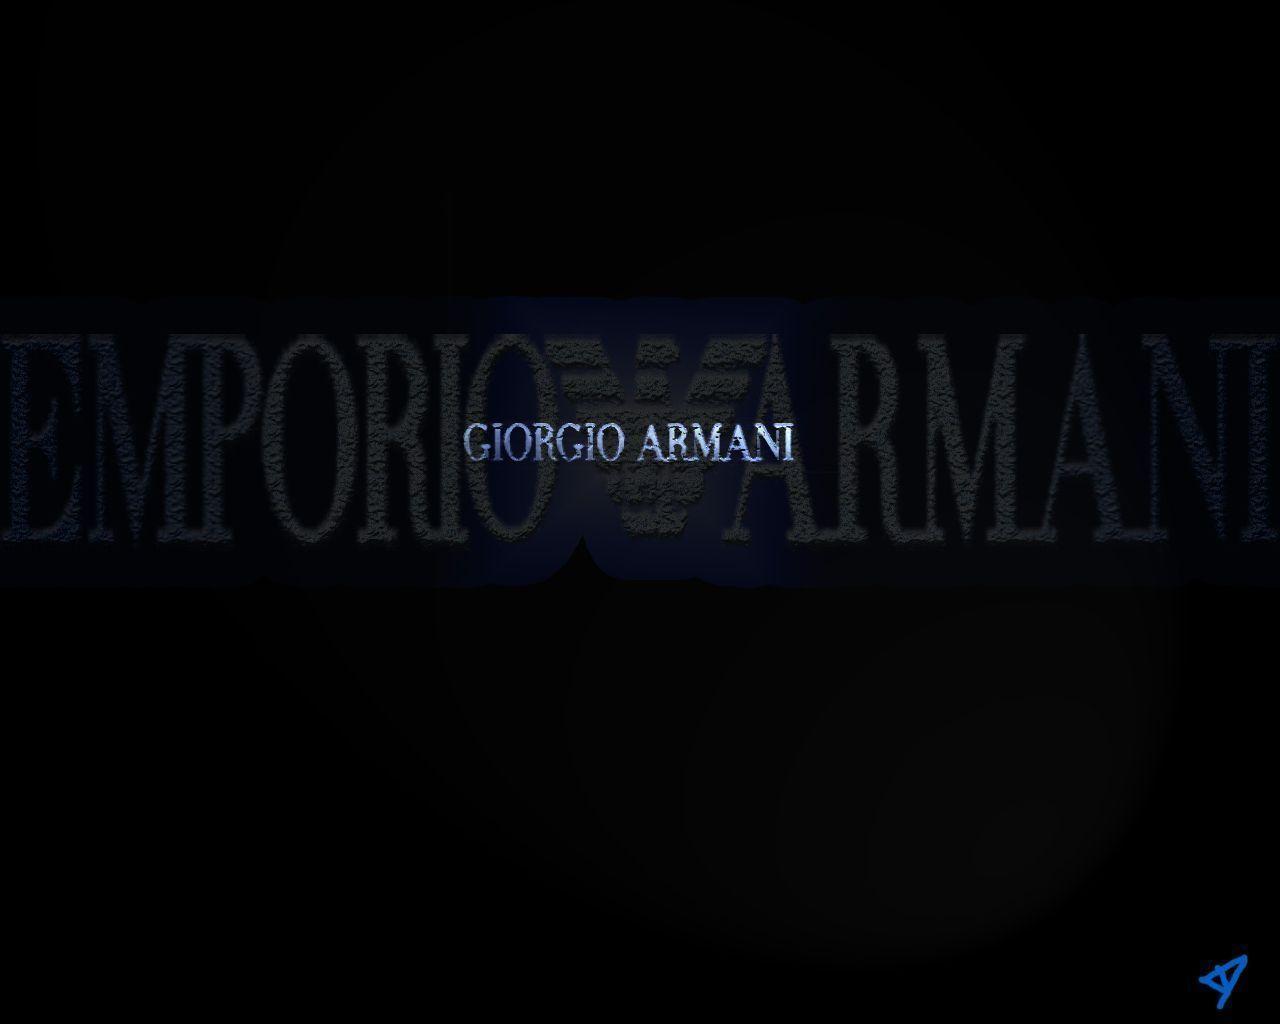 armani wallpapers wallpaper cave